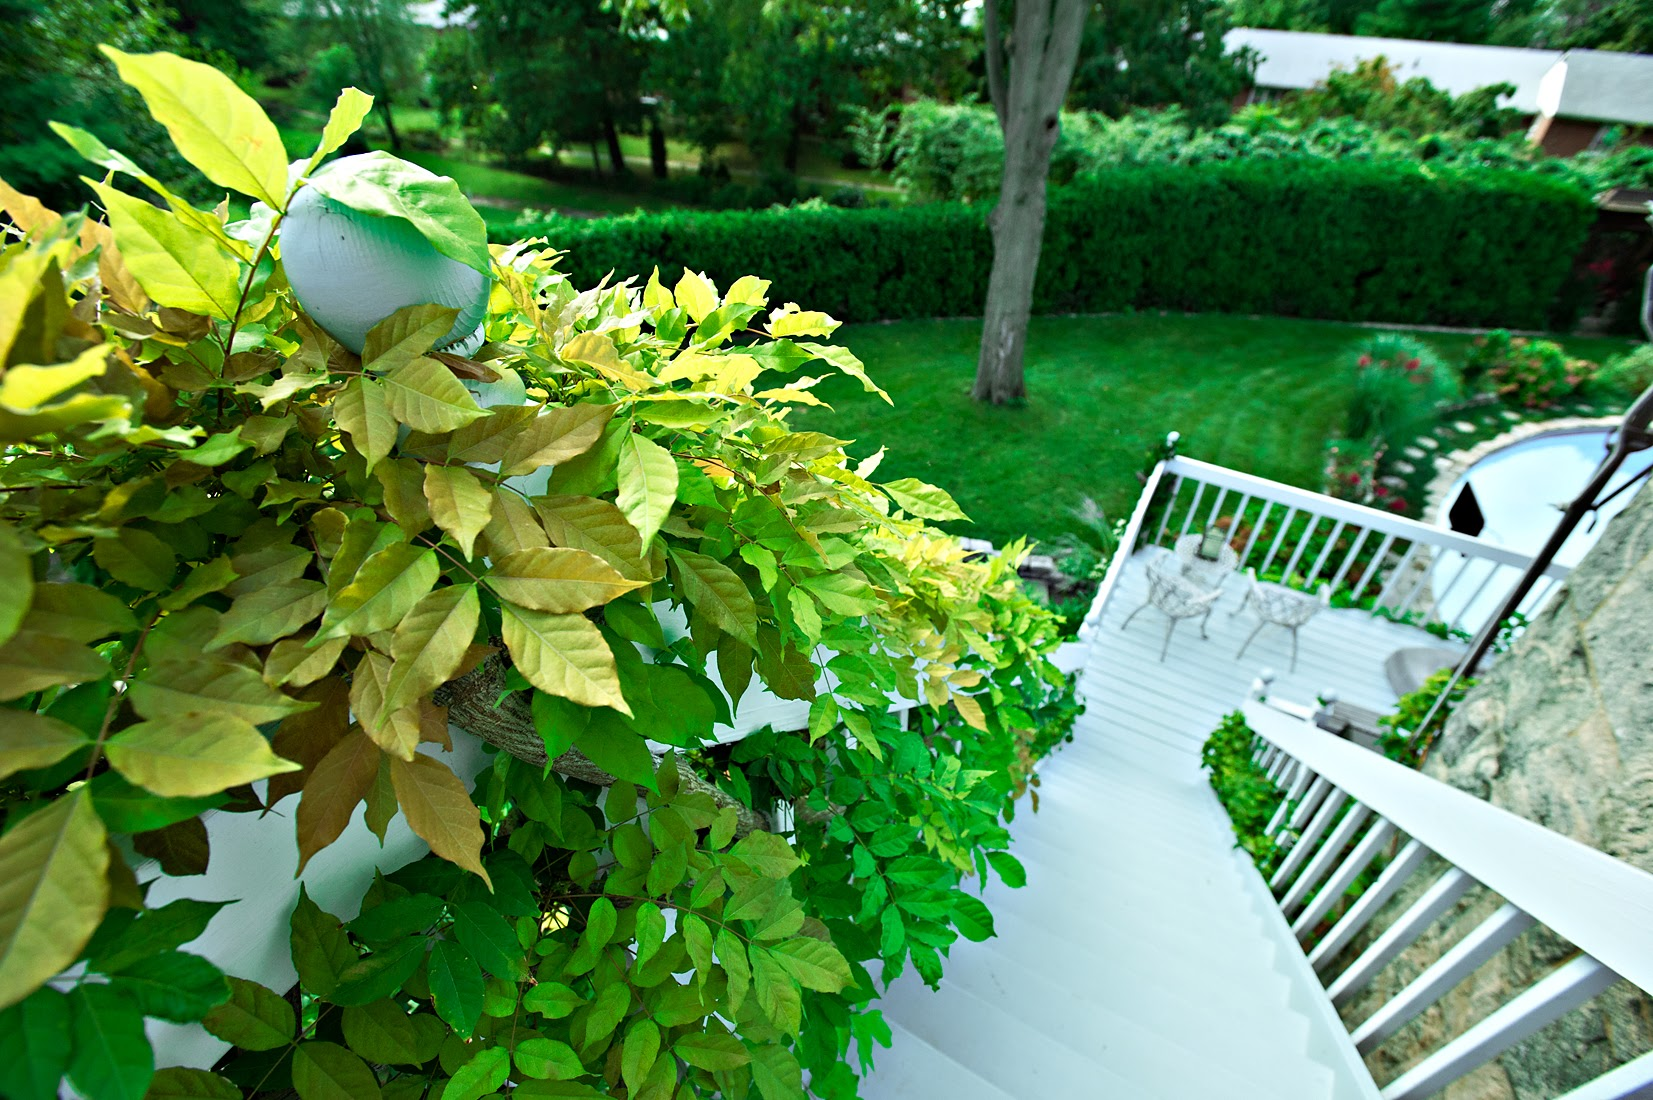 Private Residence — Irvington, NY